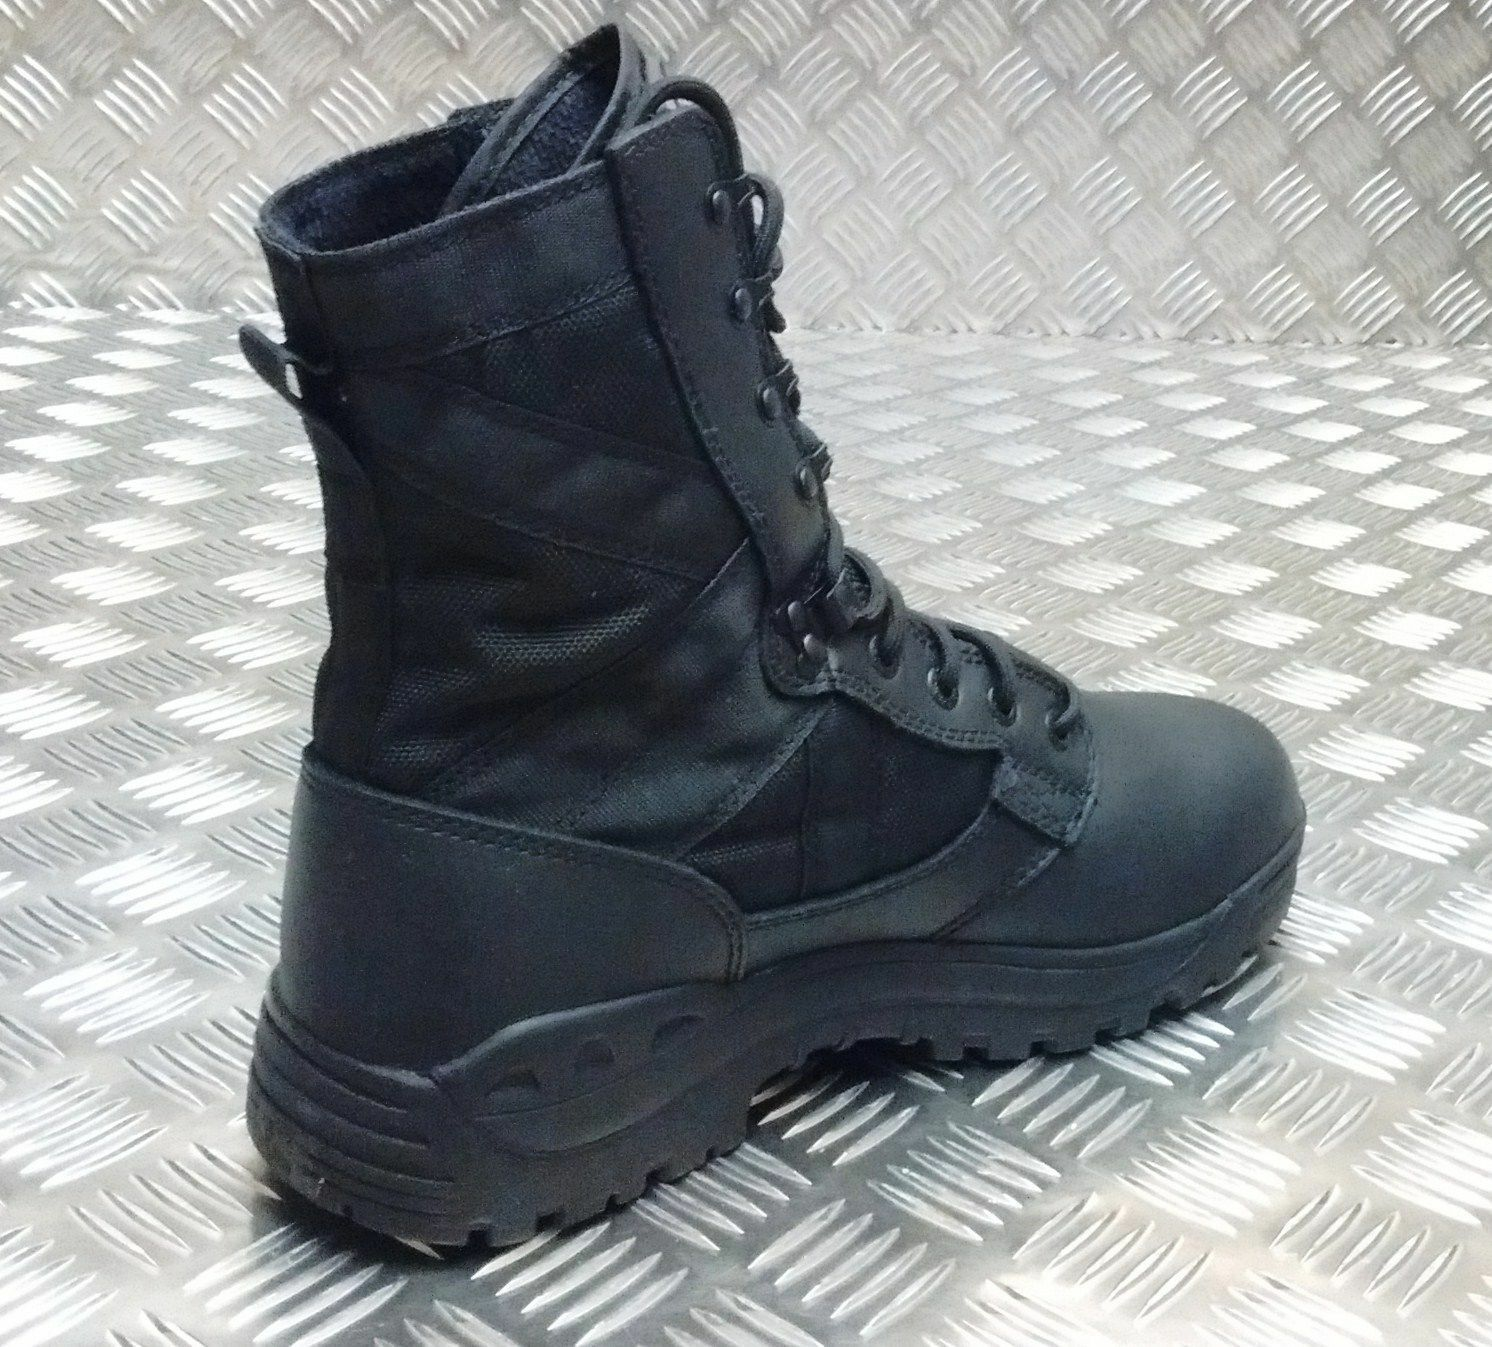 Genuine British Army Magnum Scorpion Scorpion Scorpion Black Assault / Patrol Combat Boots - NEW 180f5b